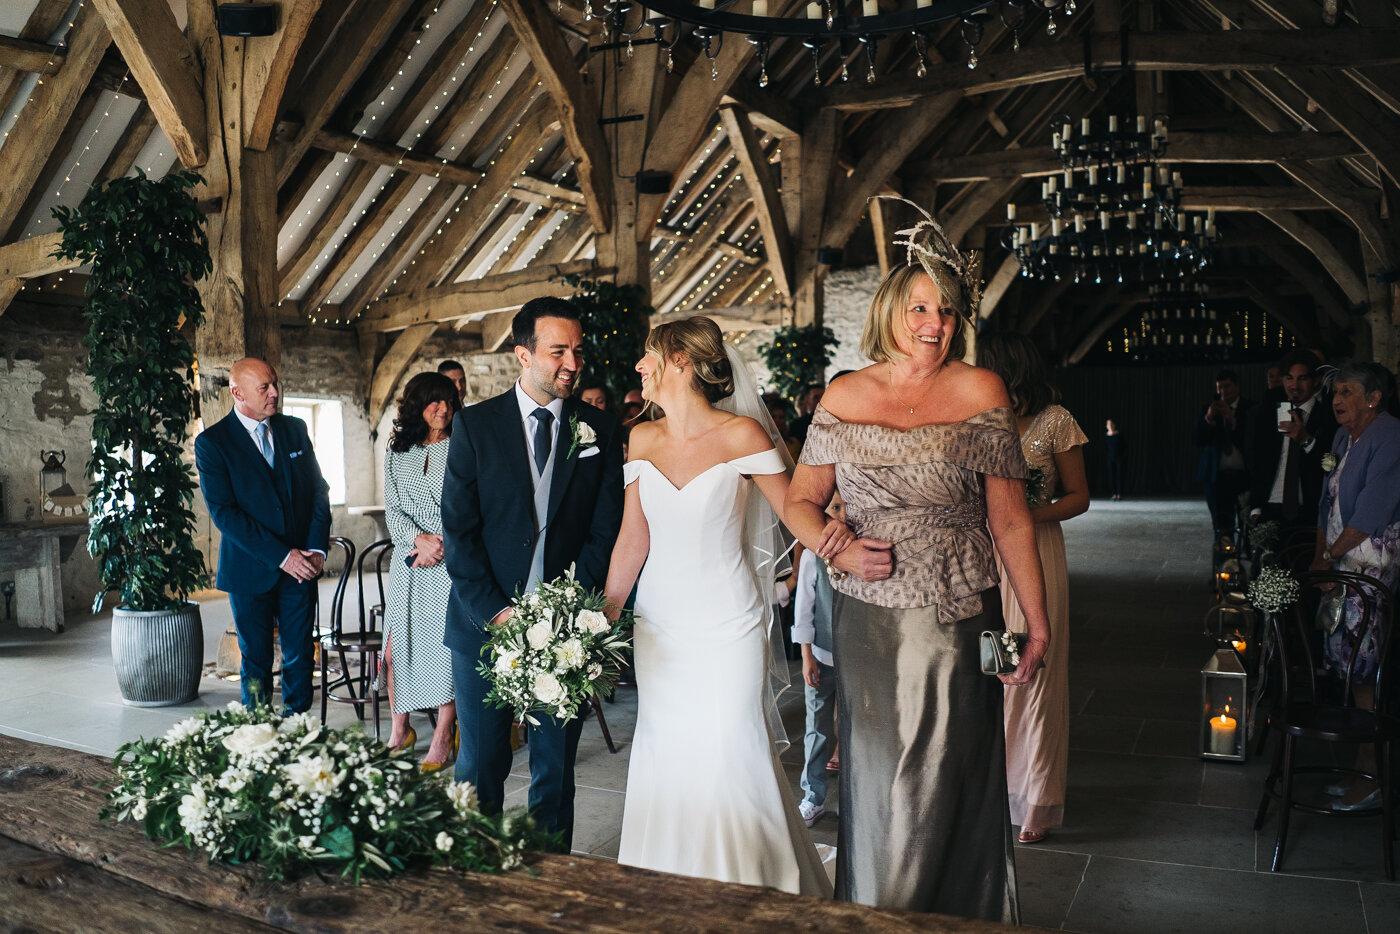 tithe-barn-bolton-abbey-north-yorkshire-cripps-wedding-photographer-creative-0022.jpg